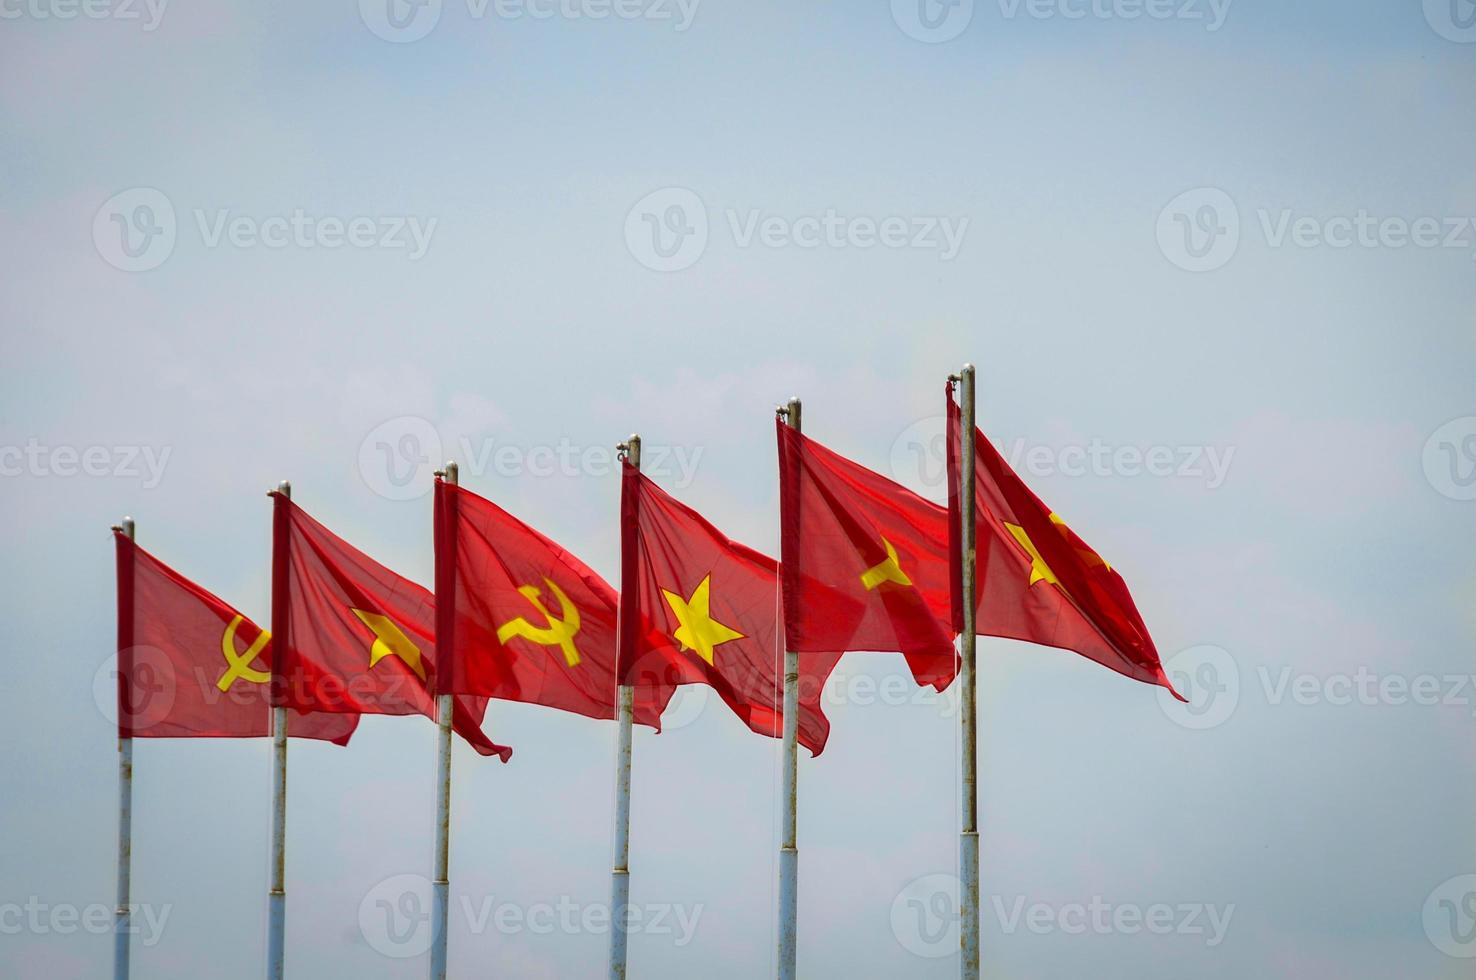 vietnam en sovietl vlag in blauwe hemel foto